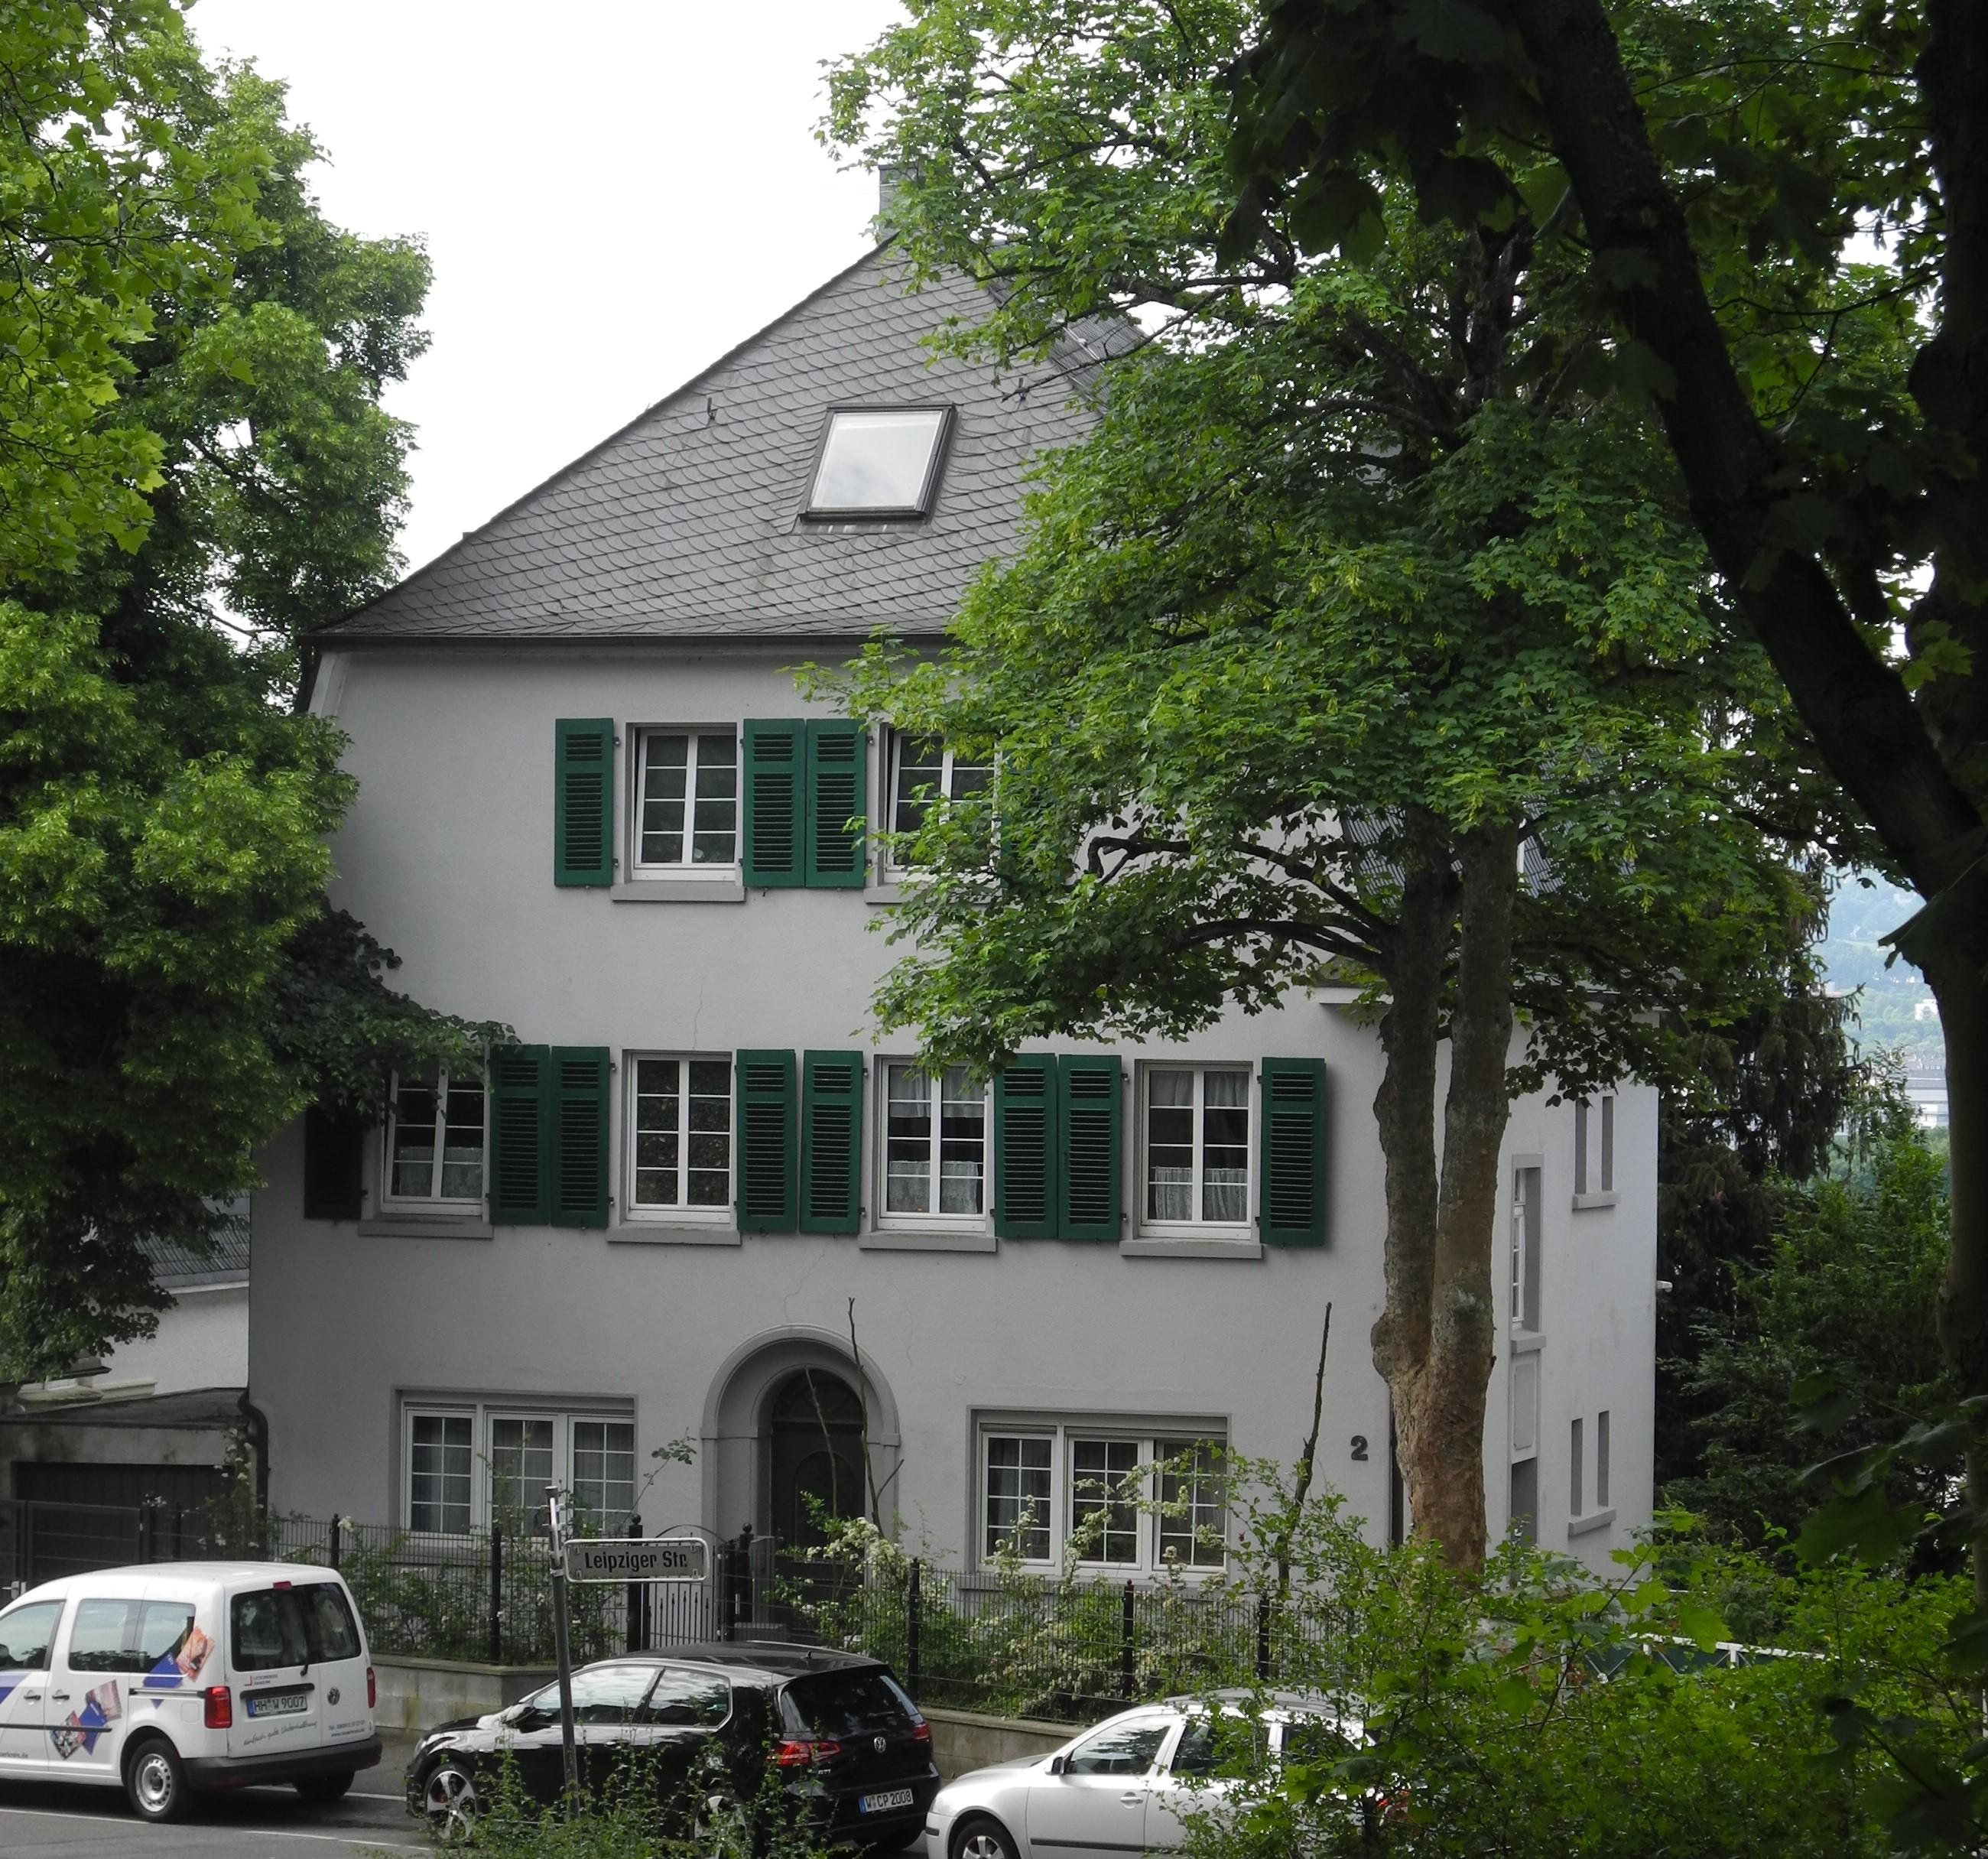 File:Wuppertal, Leipziger Str. 2, über Eck, Bild 2.jpg - Wikimedia ...